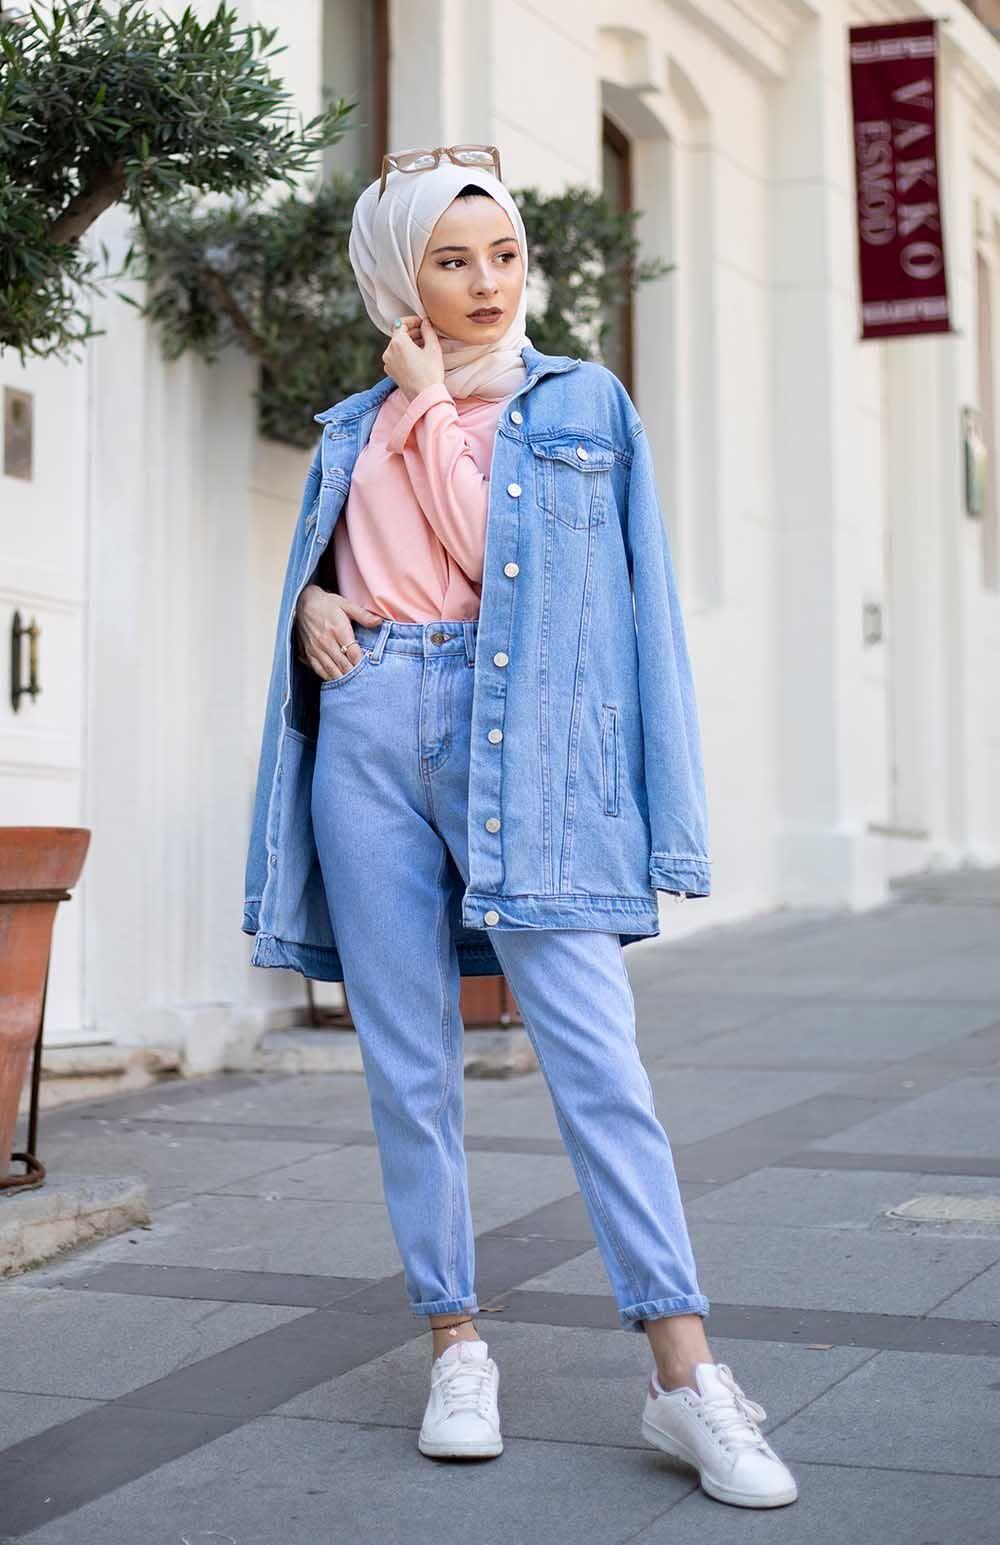 Lamelif Acik Mavi Bf Denim Ceket Islami Moda Tarz Moda Kot Ceket